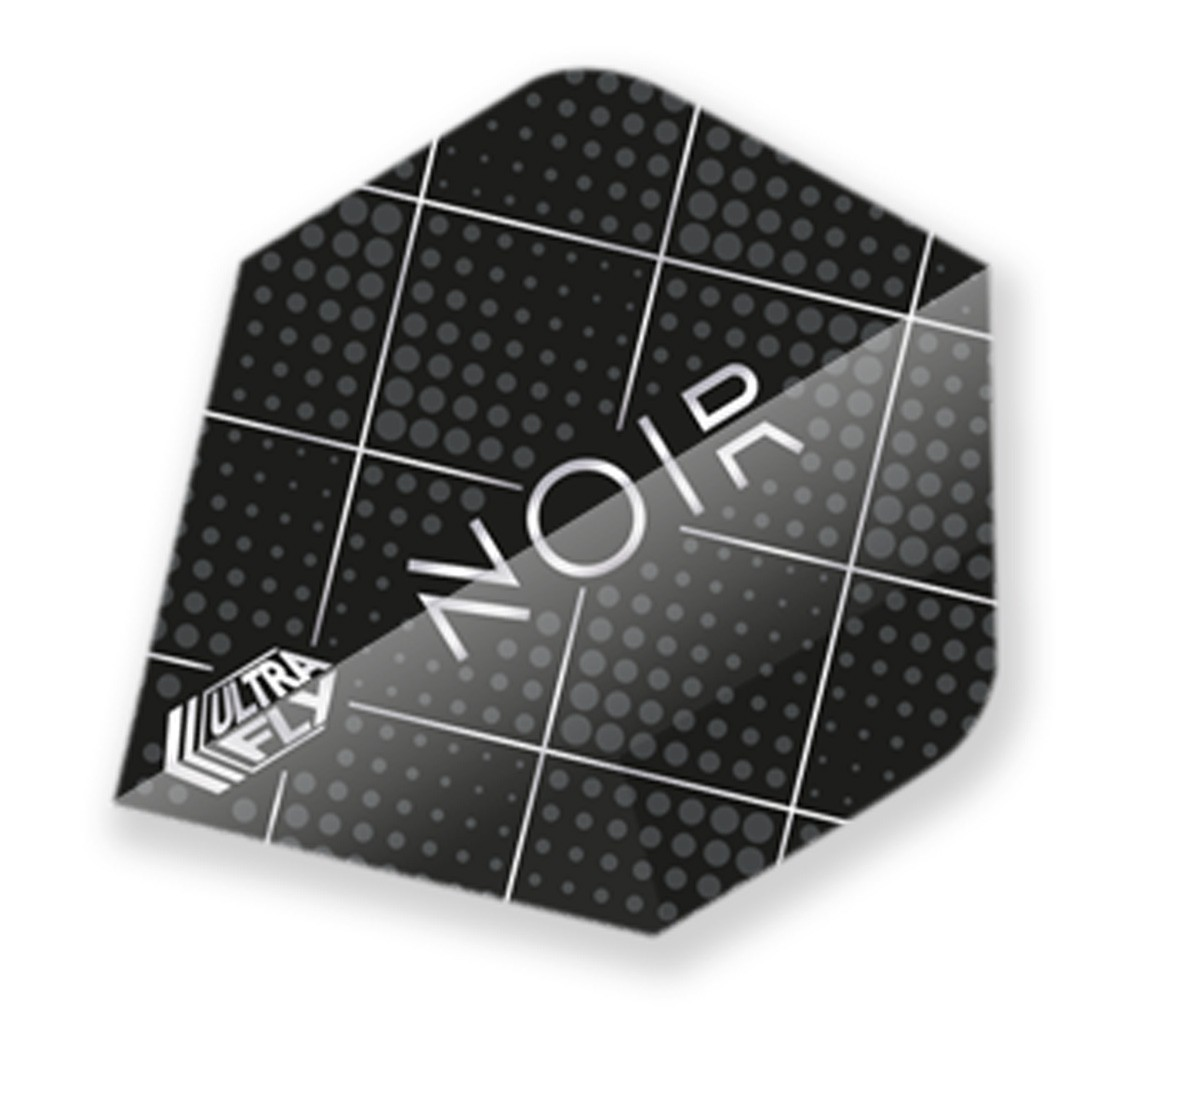 Ultrafly Flights - Noir Dot